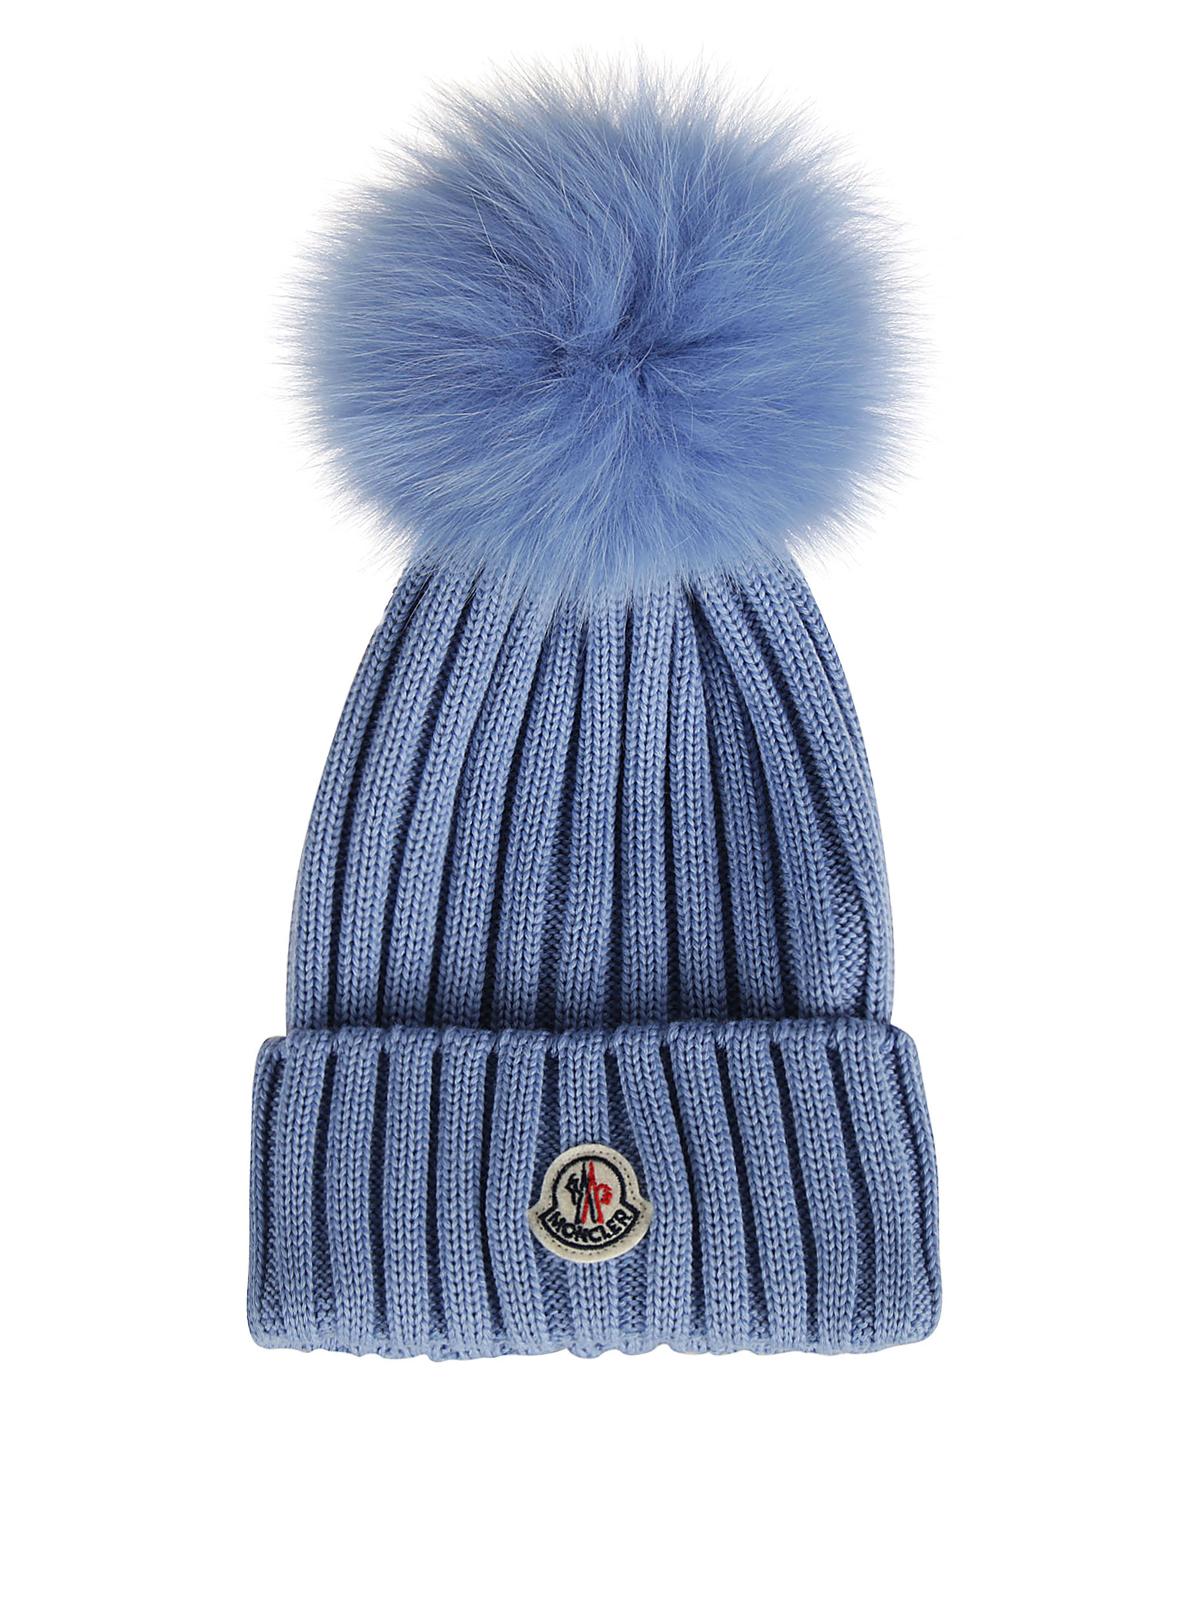 Moncler - Cappellino in lana con pompon - cappelli - 00219 00 03510 70C da0aad1eb6ee